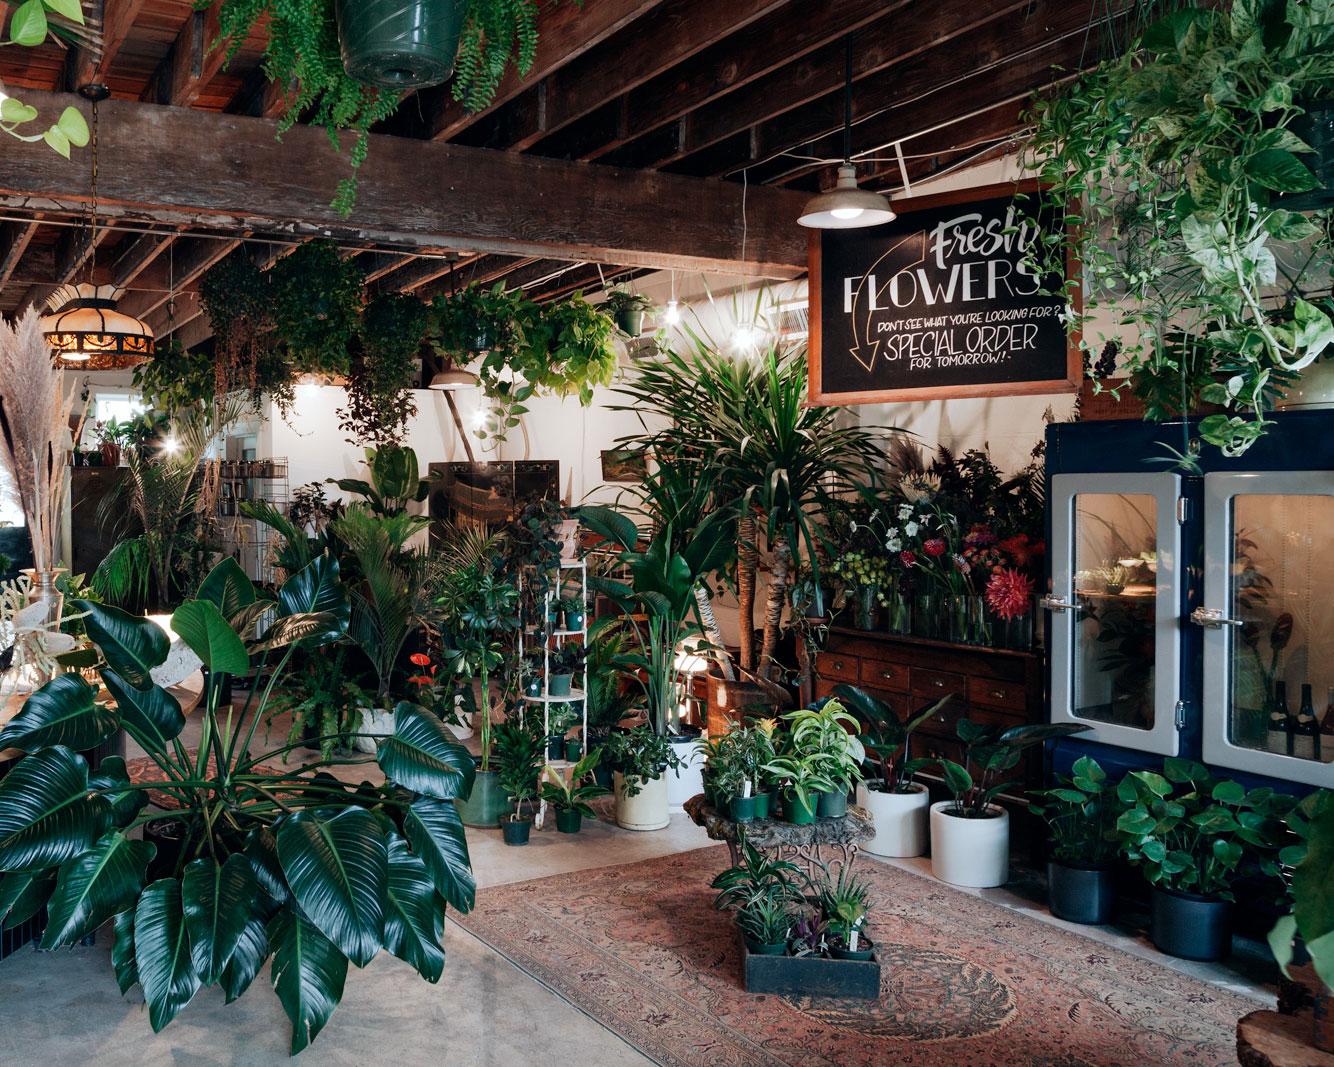 FLOWER STUDIO& PLANT SHOP - 1454 NE PRESCOTT STREETPORTLAND, OREGON 97211